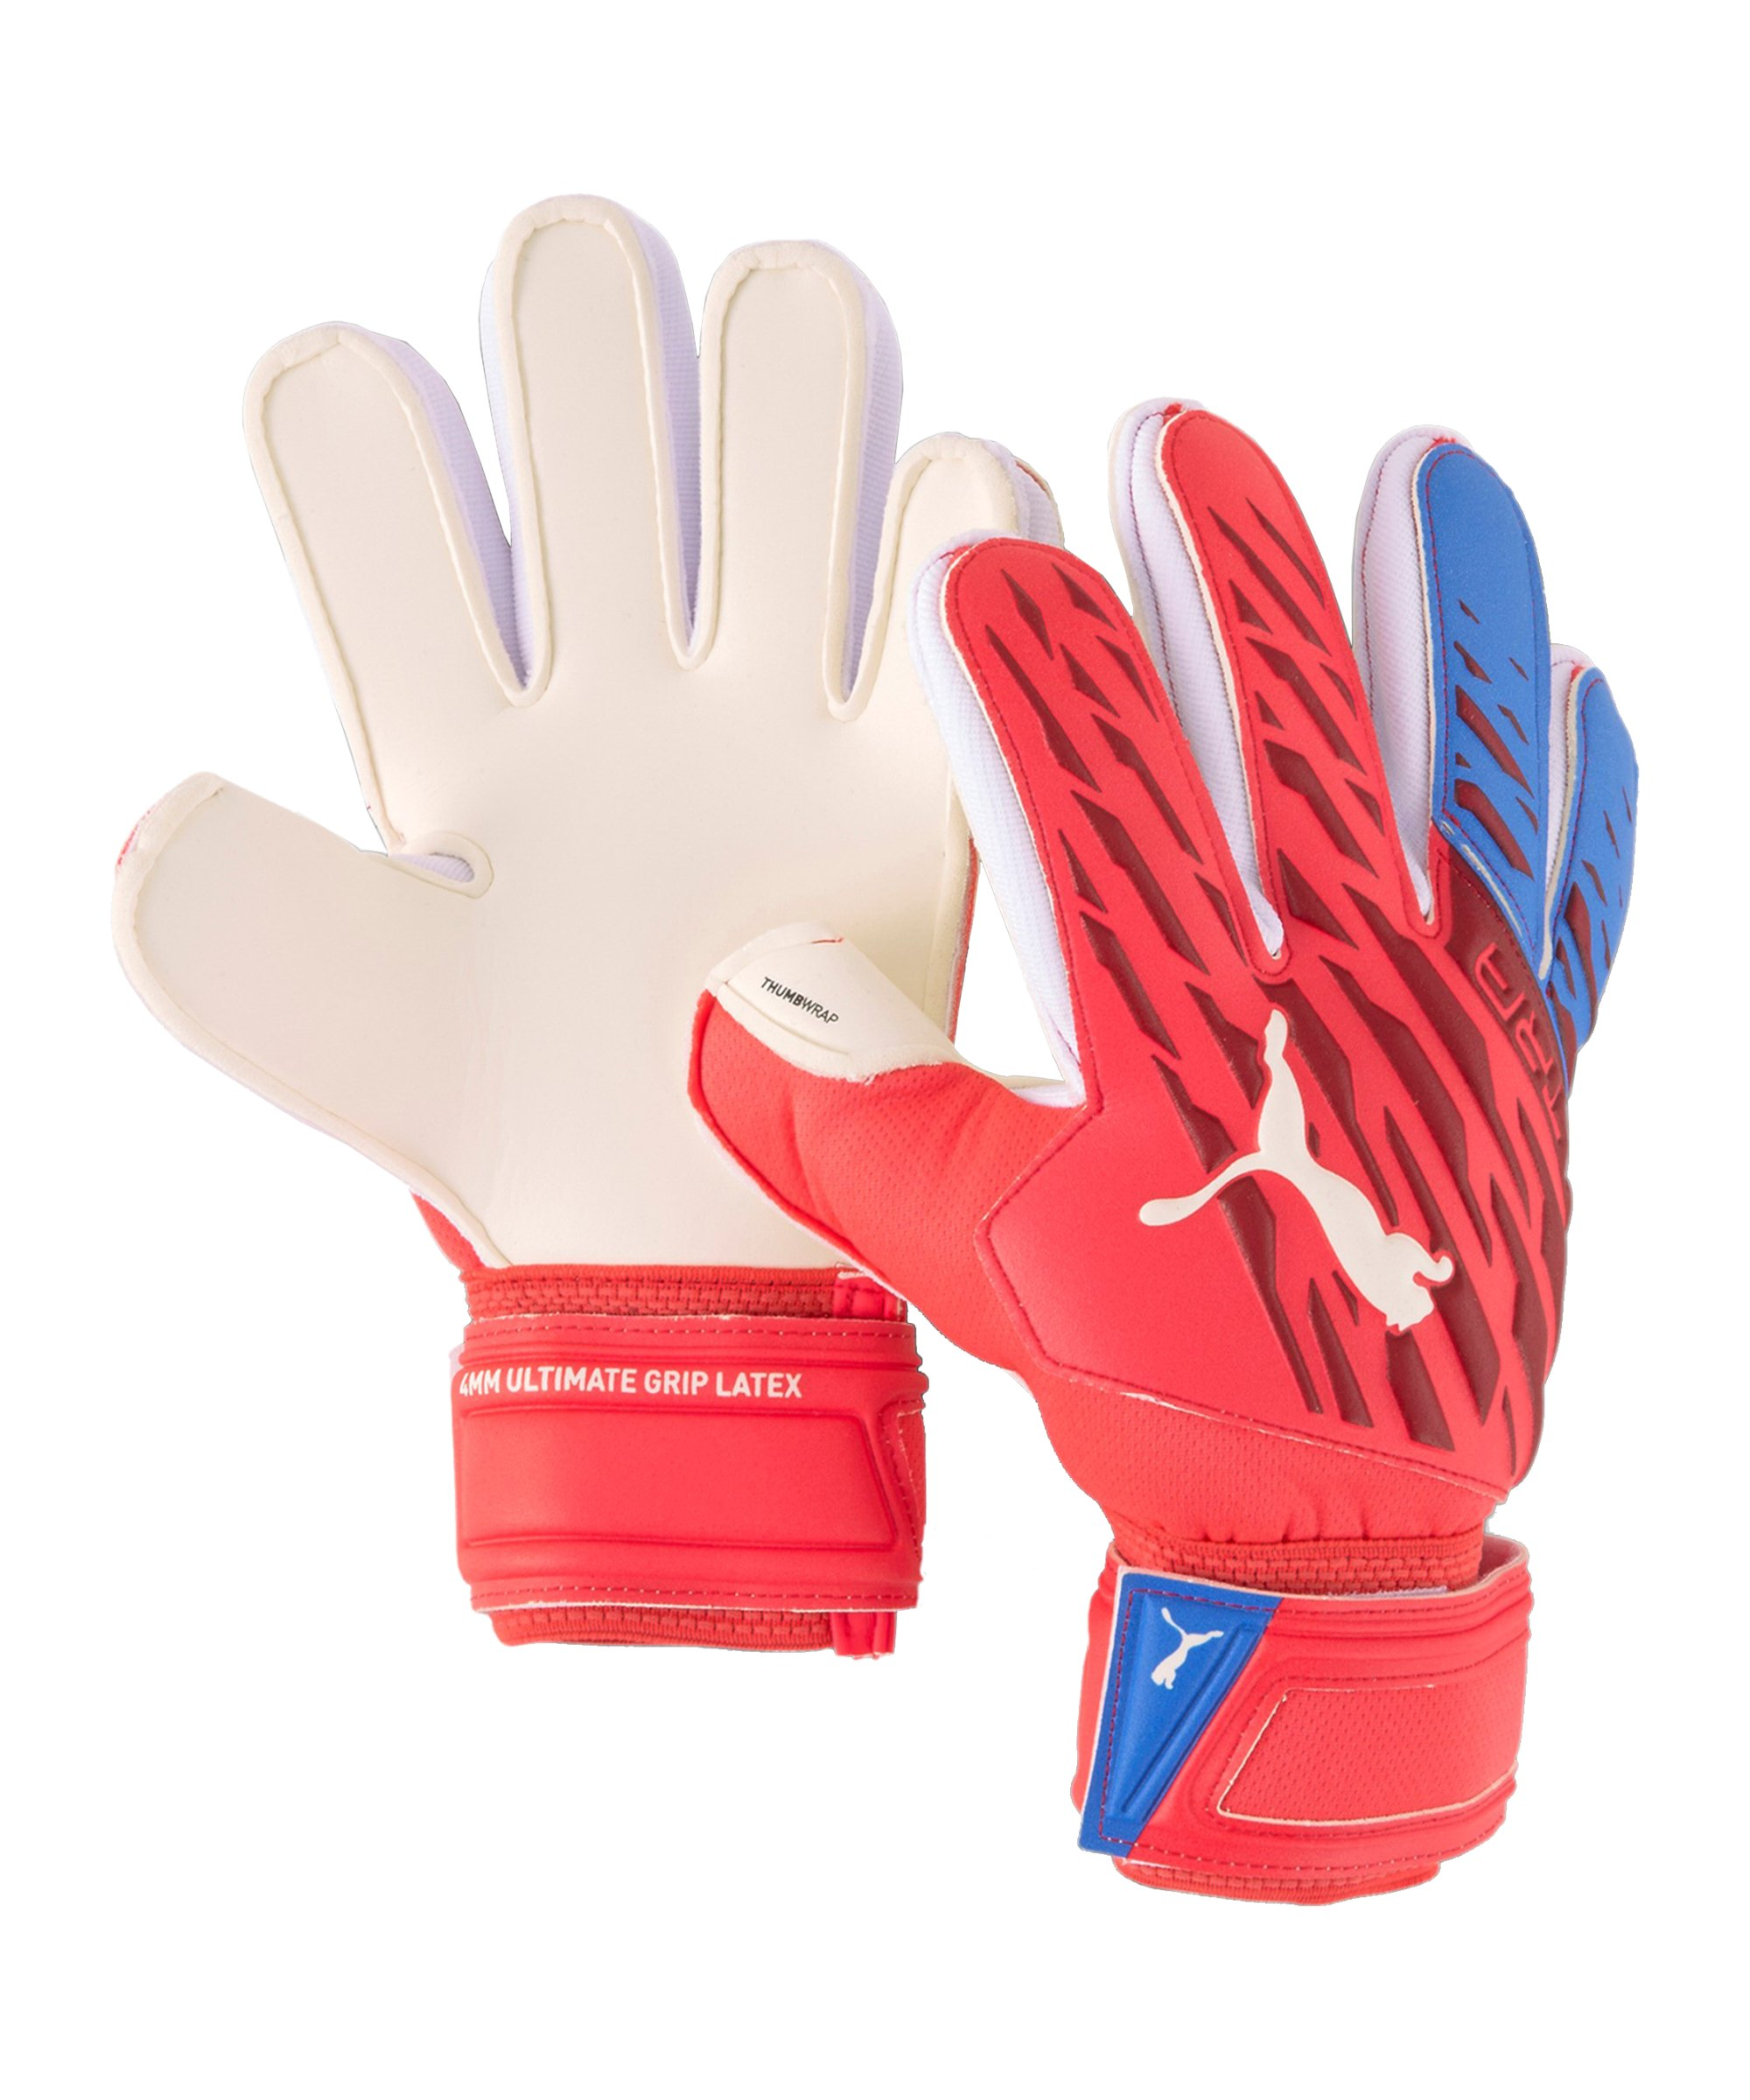 PUMA ULTRA Grip 1 RC Faster Football TW-Handschuh Kids Rot F01 - rot